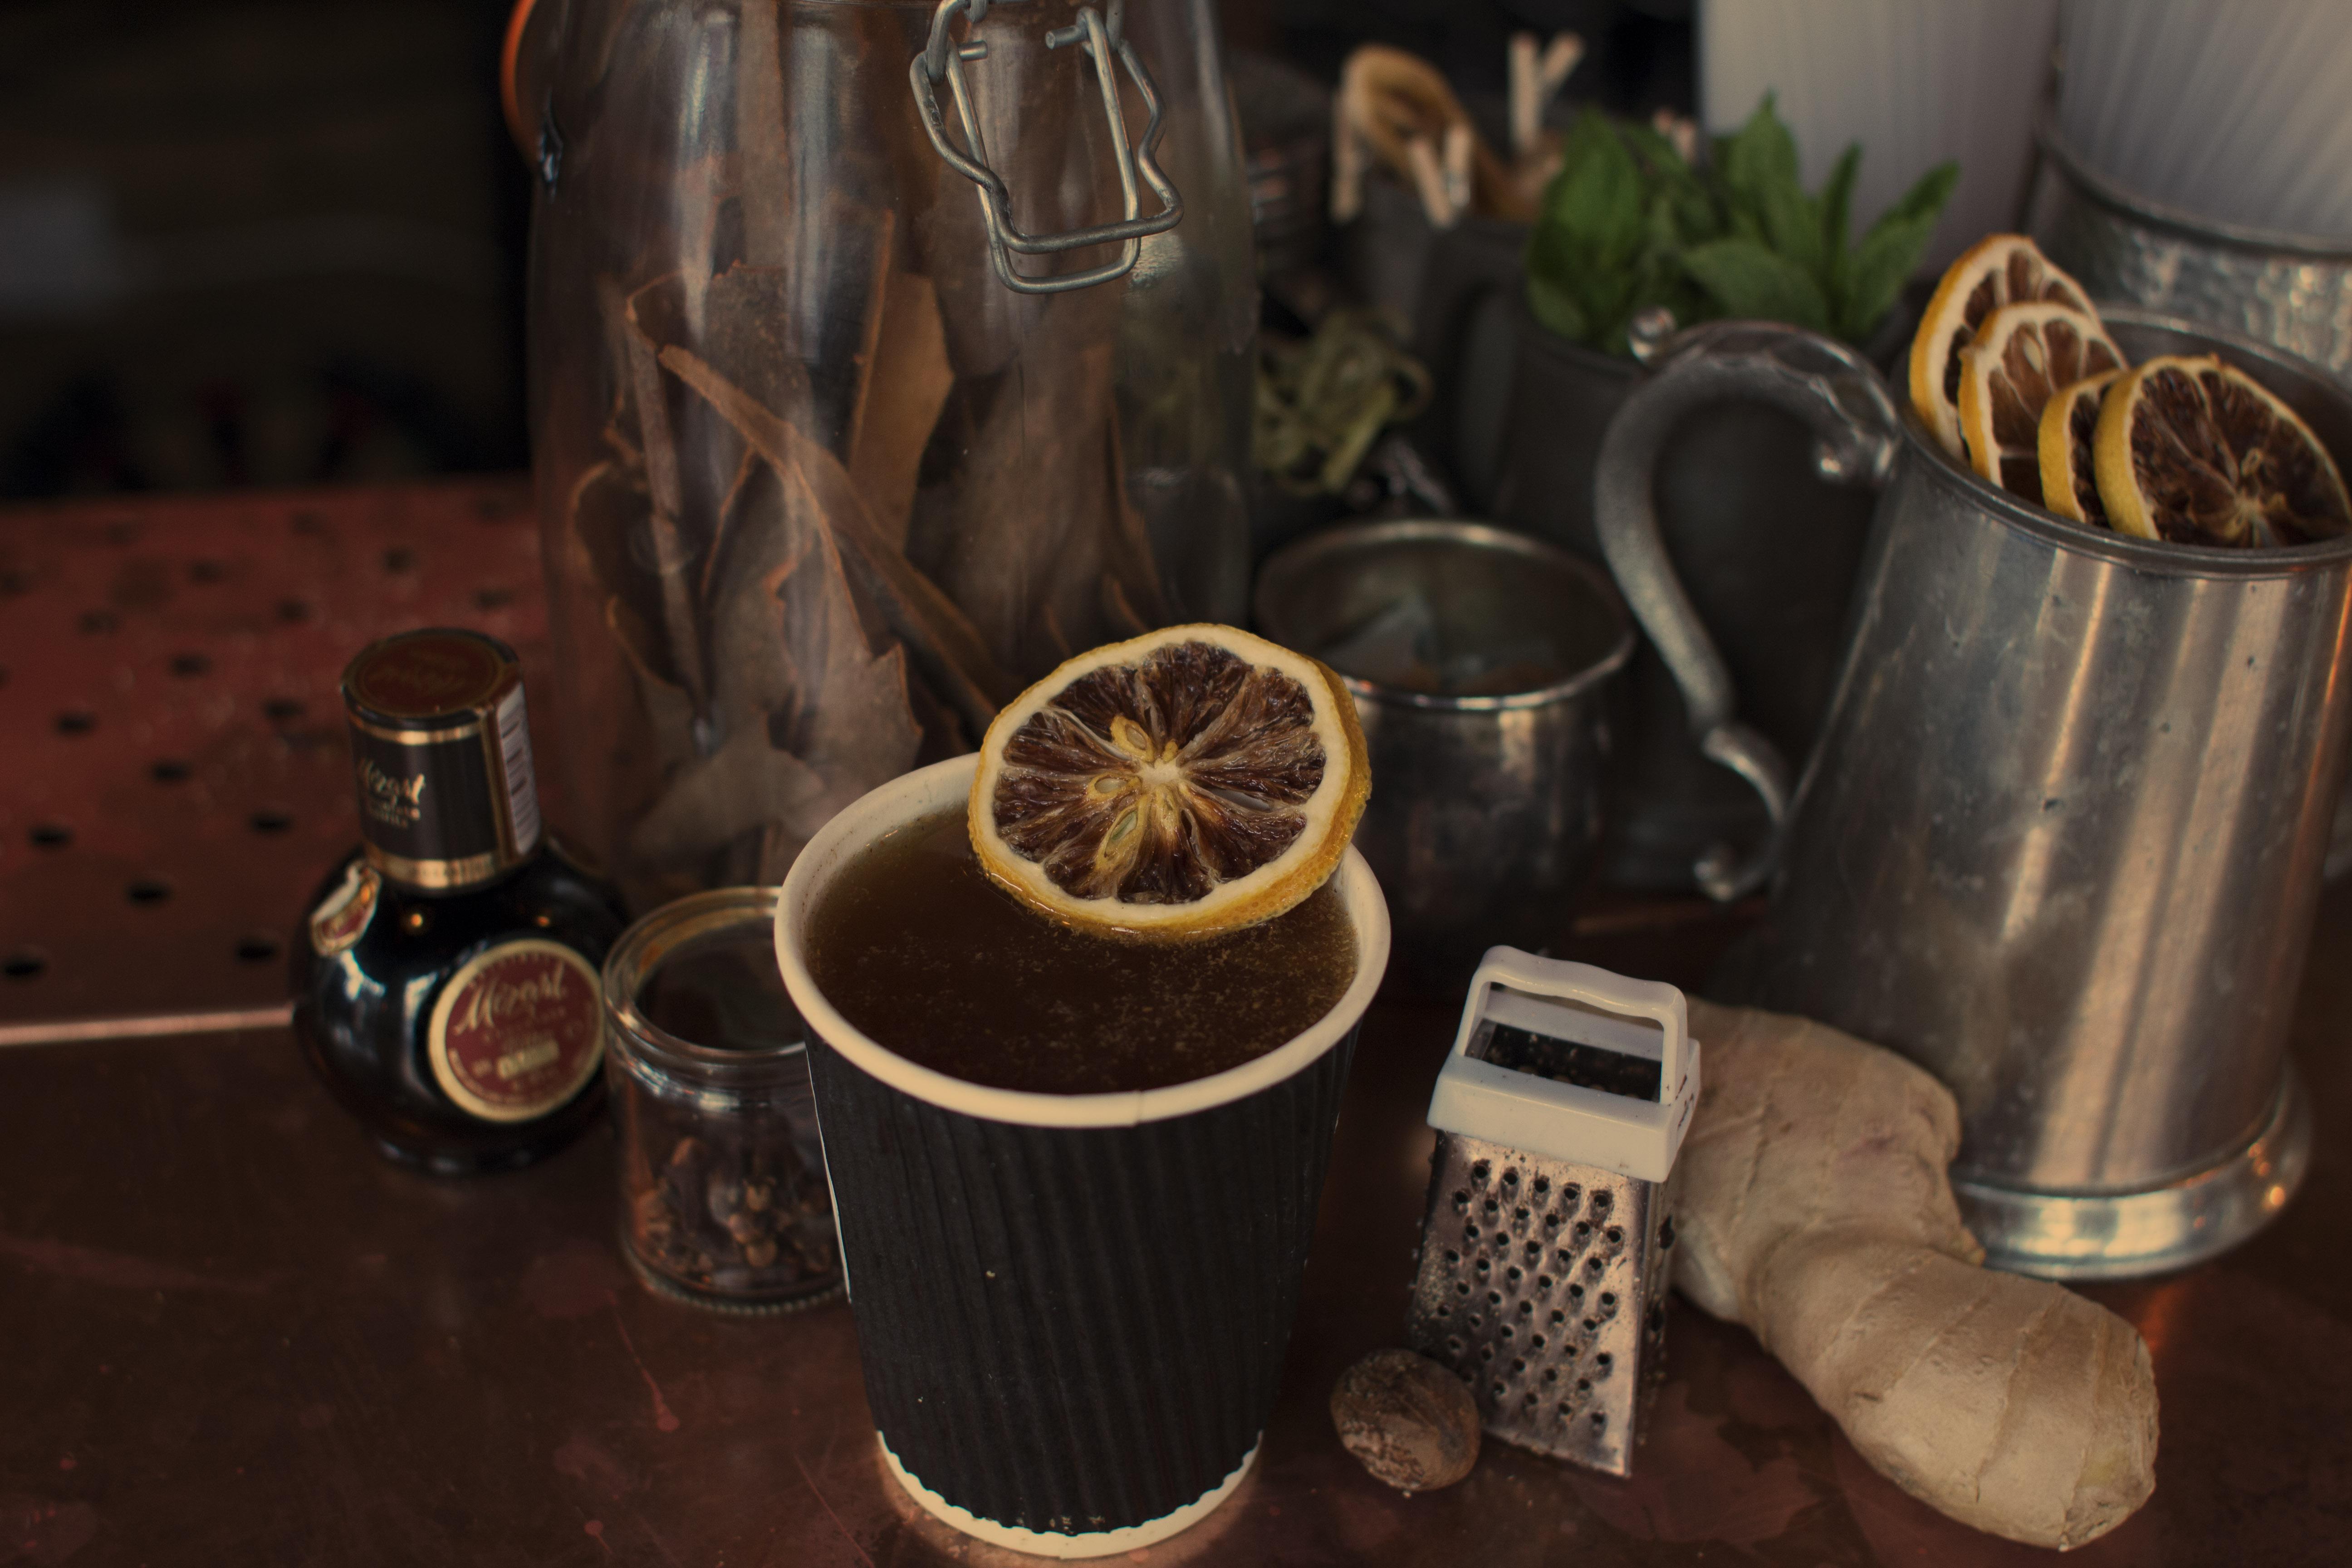 thesuntavern-hot punch-ingredients-cocktail-bar-bethnalgreen-02